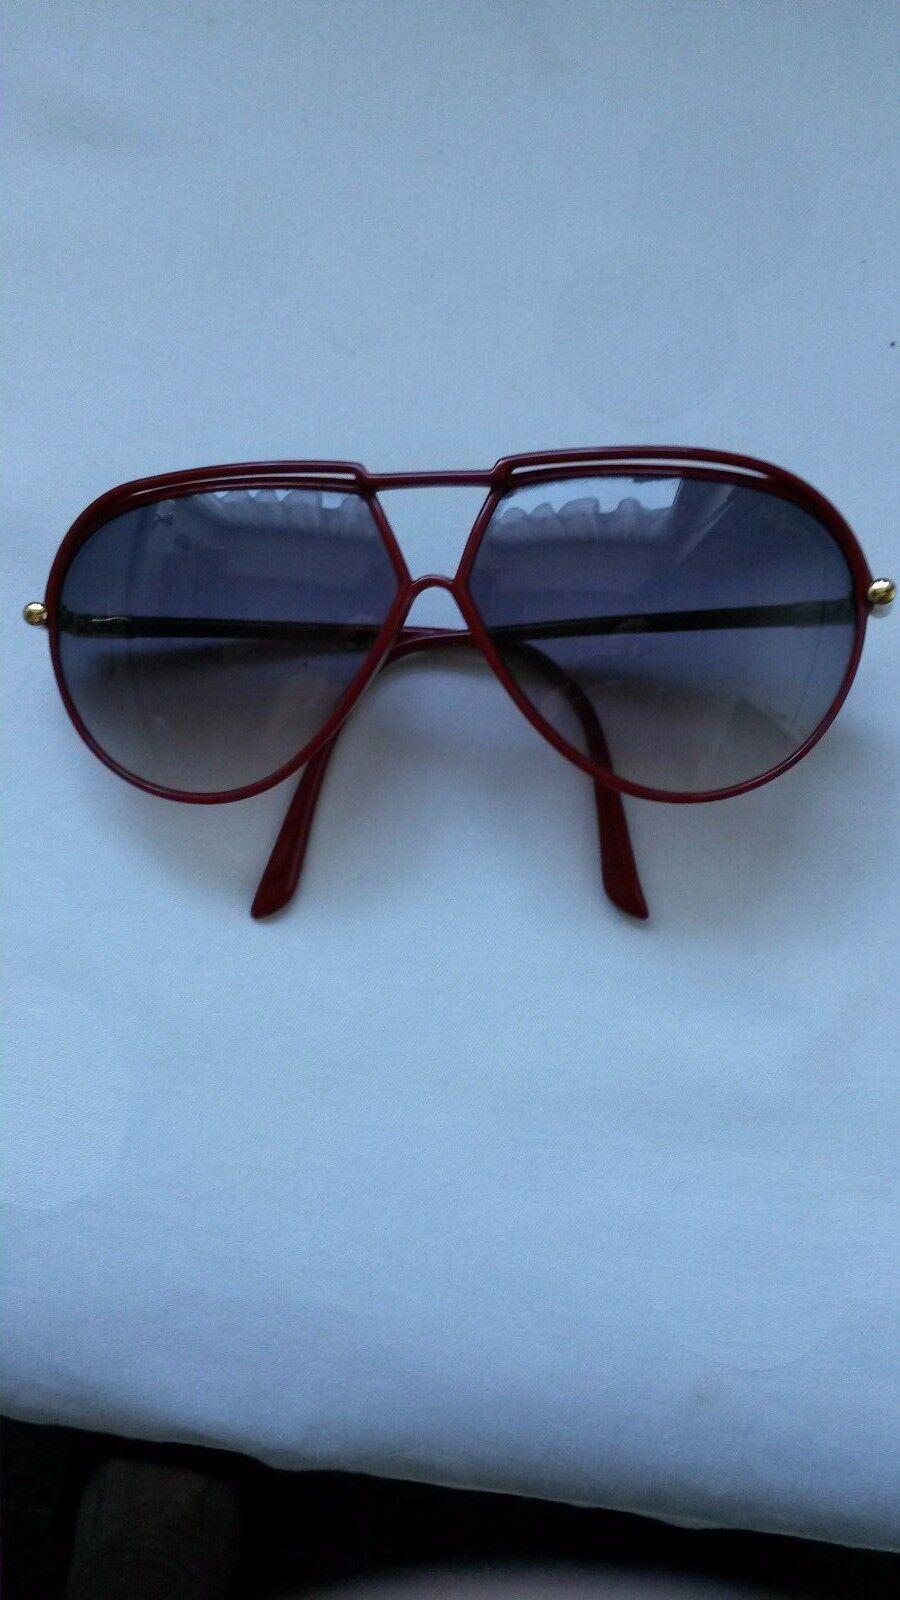 Yes saint Laurent Sonnenbrille Nr.8129-9 Nr.8129-9 Nr.8129-9 Y21 | Schöne Kunst  | Shopping Online  033a35